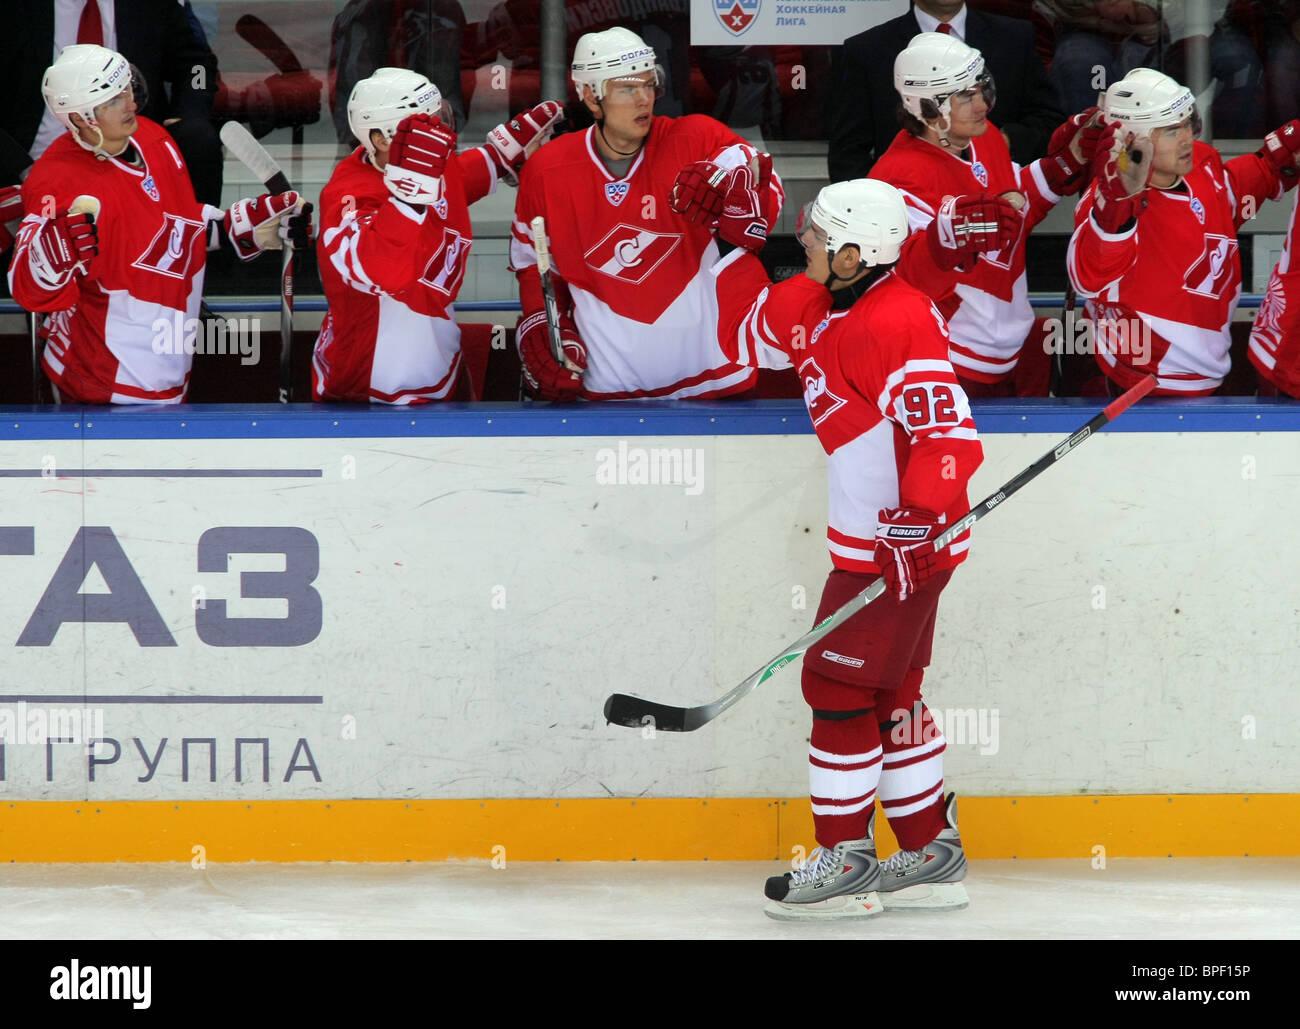 f5411d76f77 Cska Moscow 2 1 Spartak Moscow Stock Photos   Cska Moscow 2 1 ...